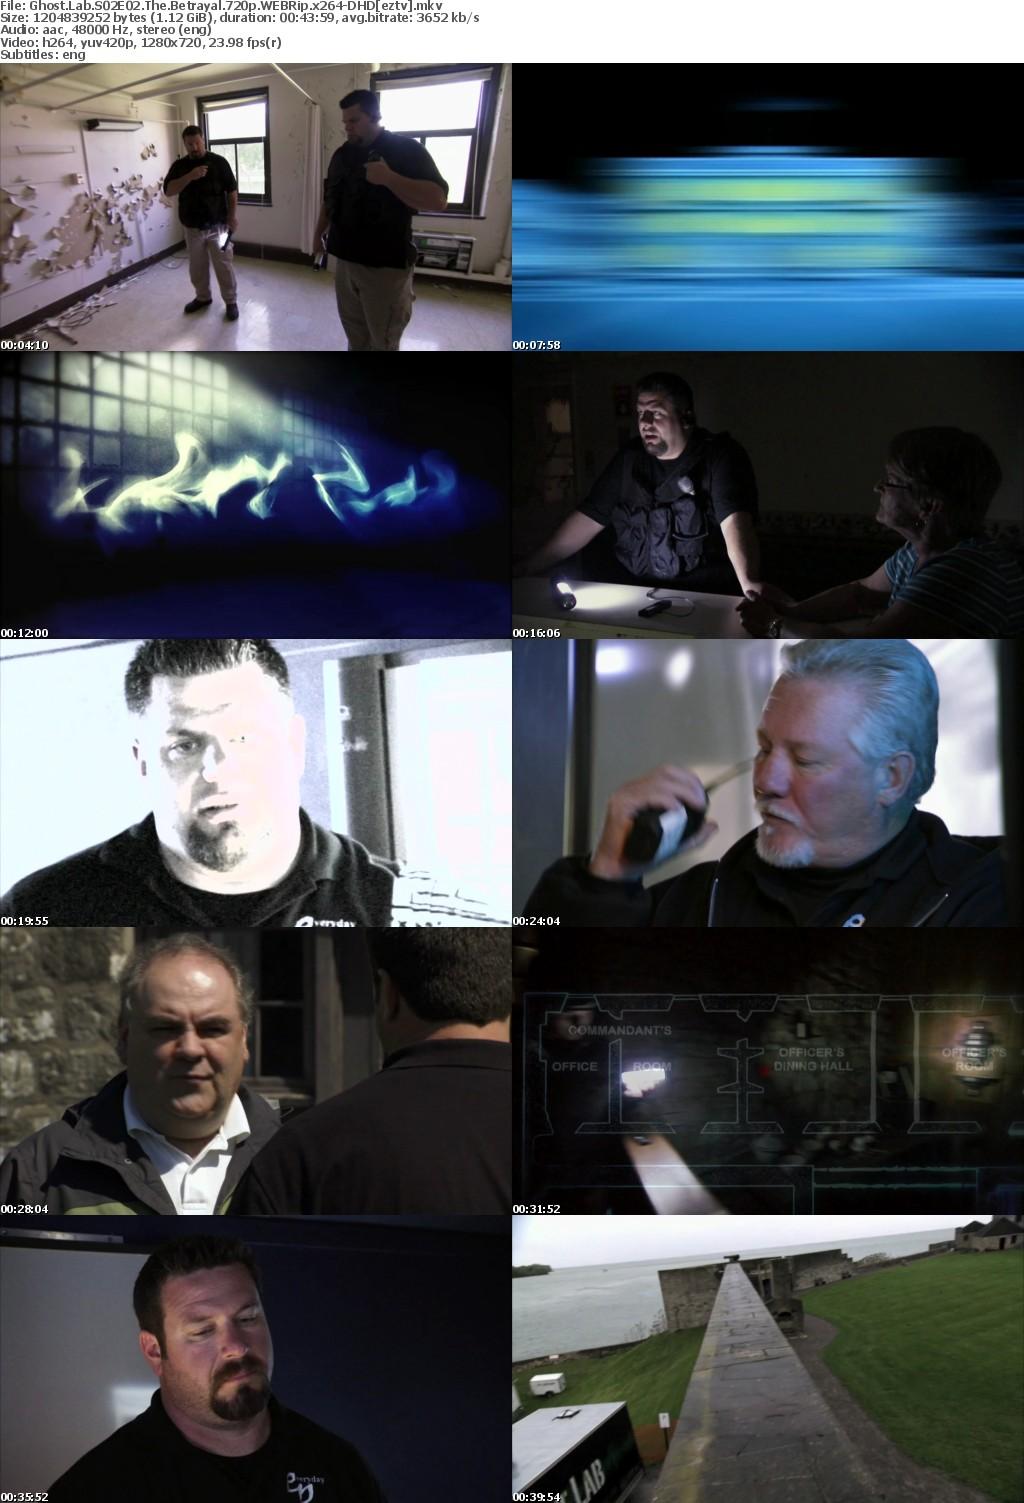 Ghost Lab S02E02 The Betrayal 720p WEBRip x264-DHD